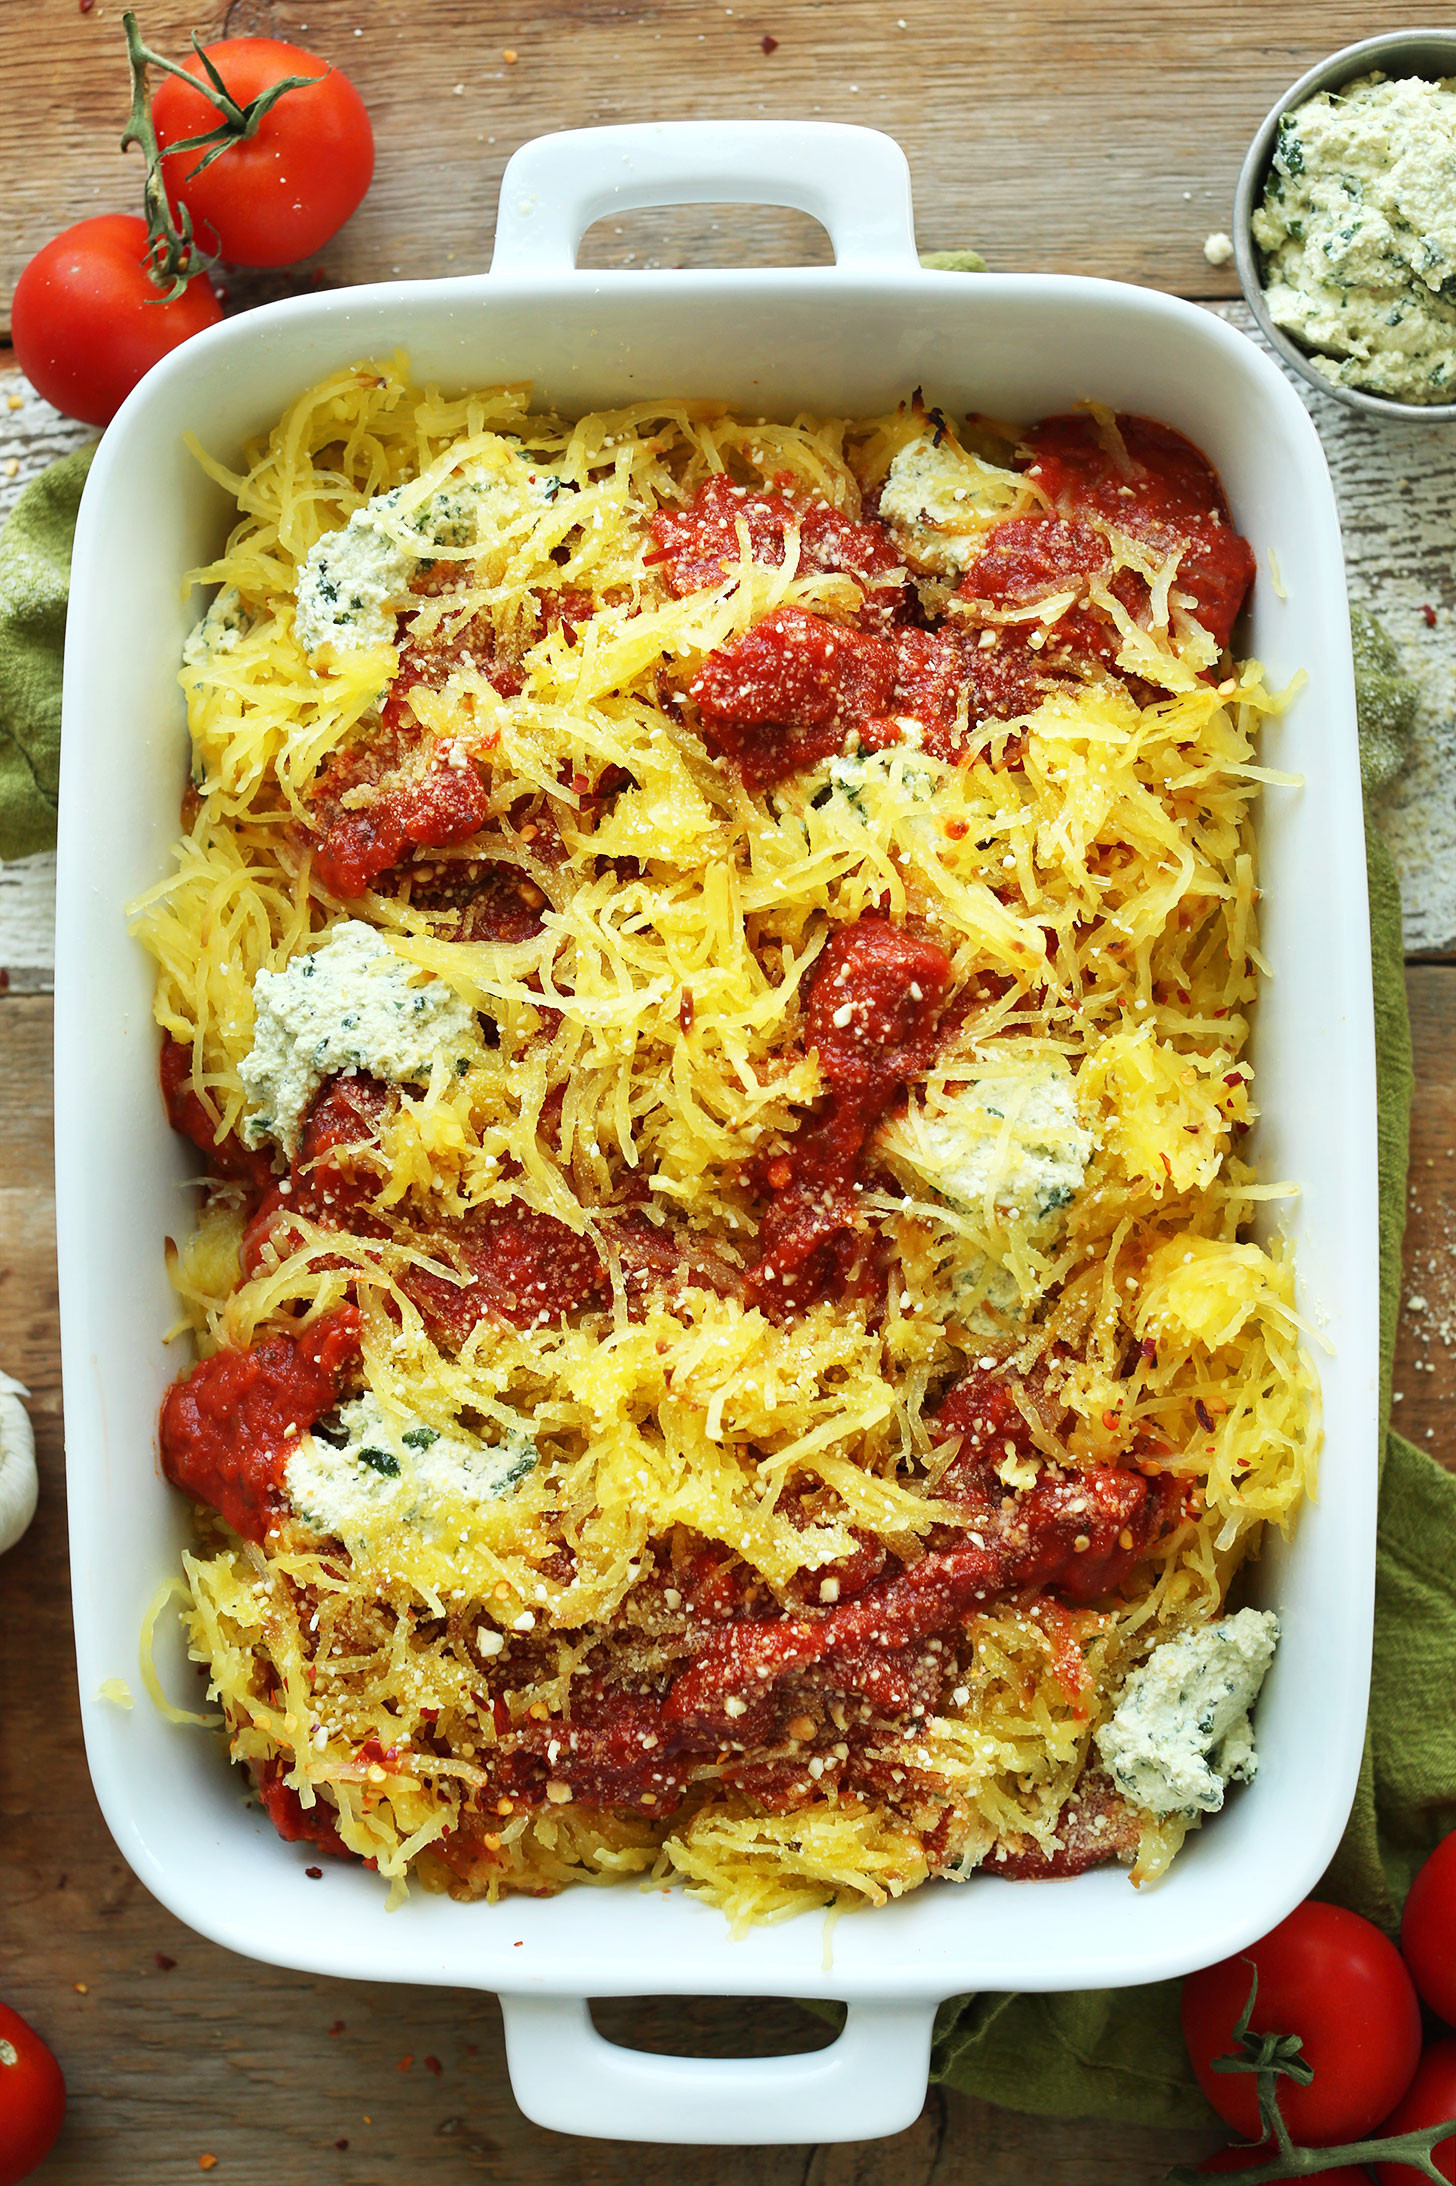 Healthy Spaghetti Squash Recipes  Spaghetti Squash Lasagna